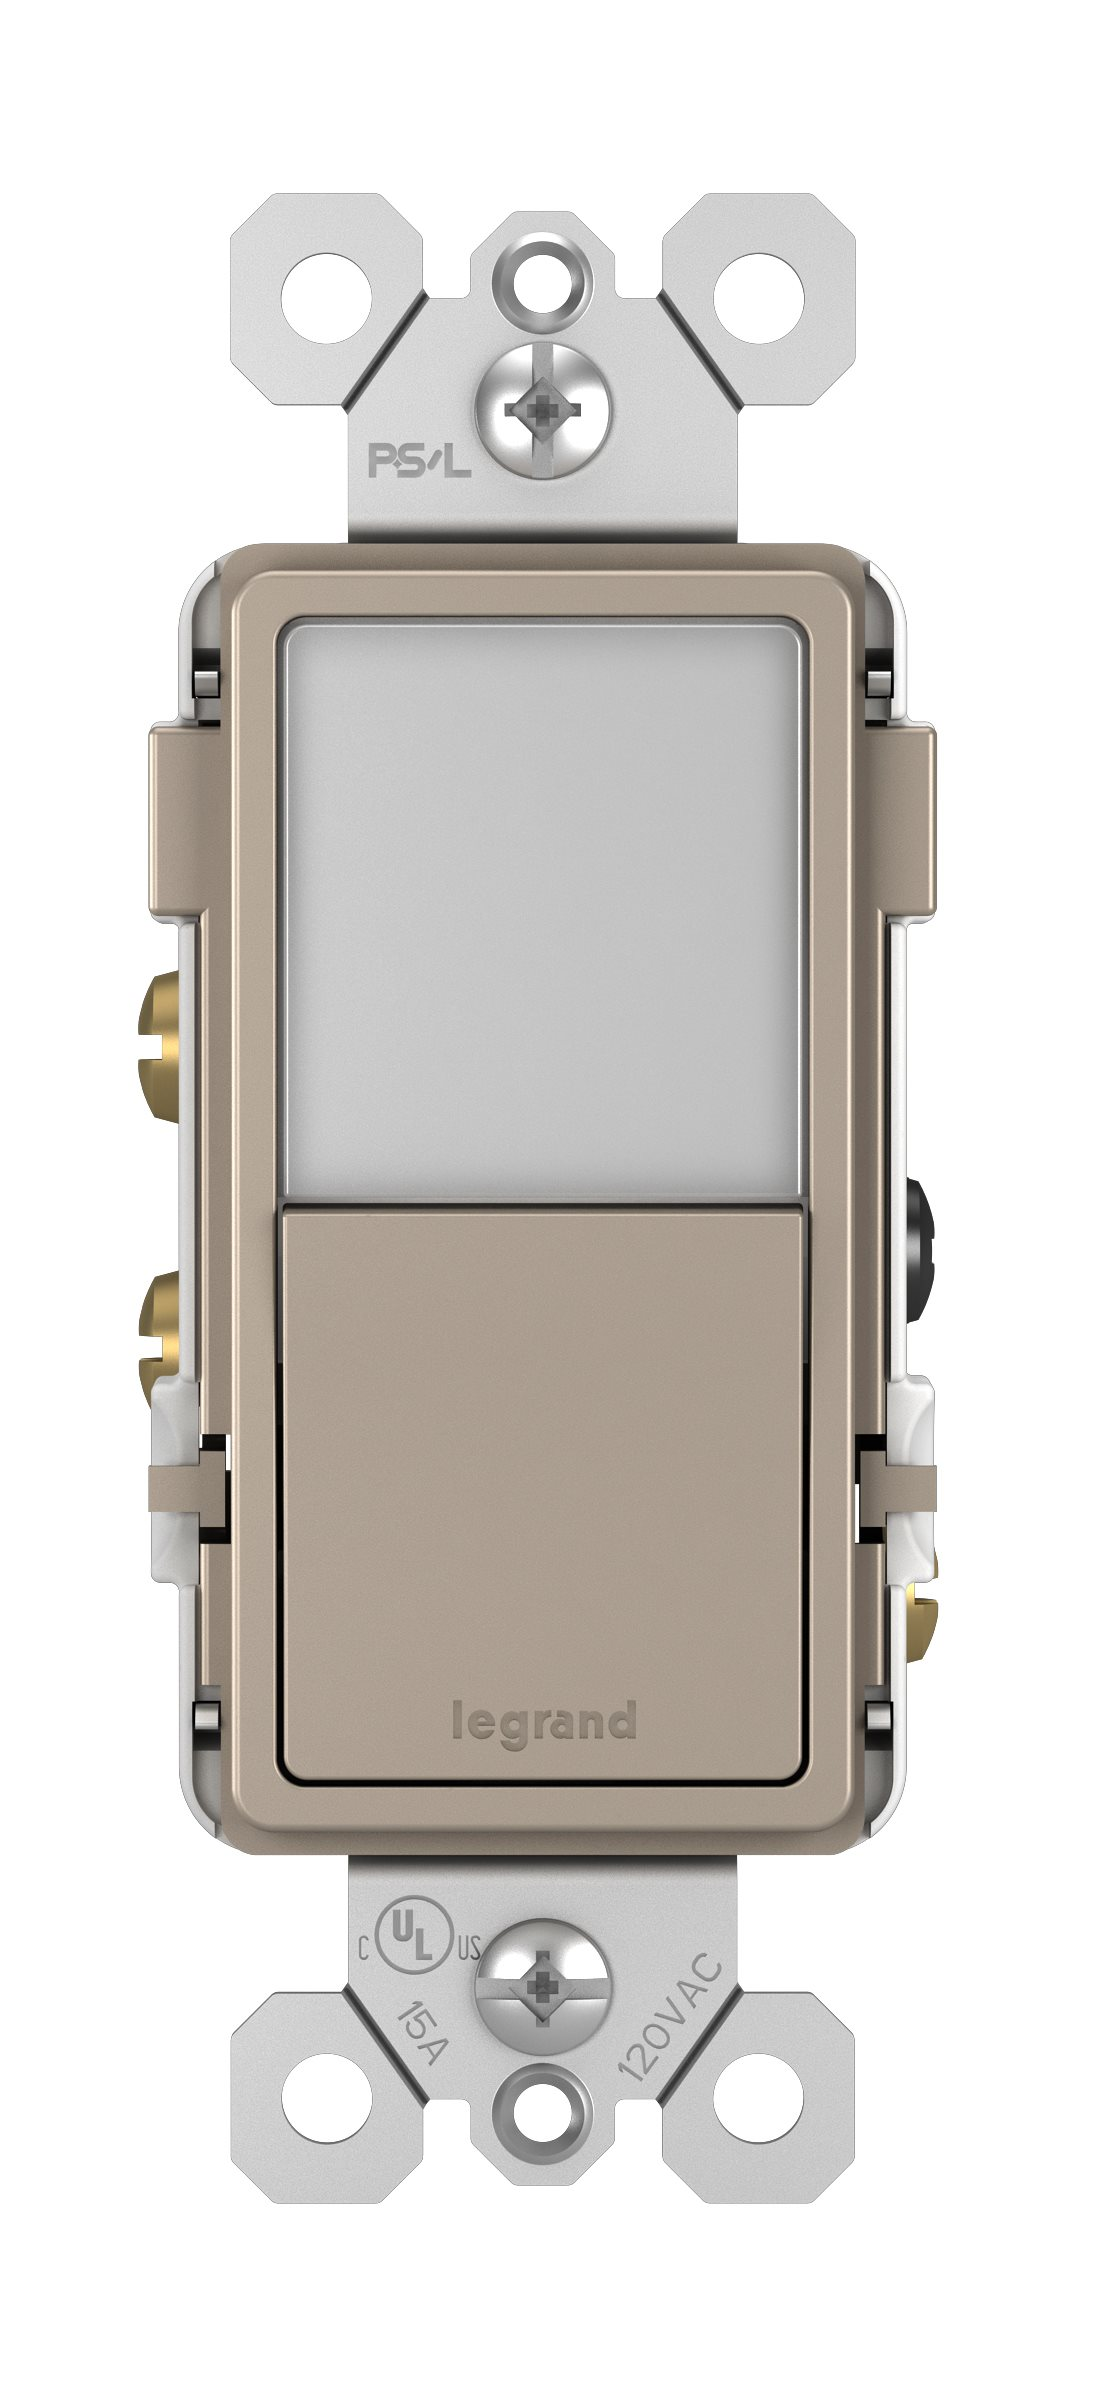 Legrand Radiant Night Light + Single Pole/3-Way Switch - Nickel